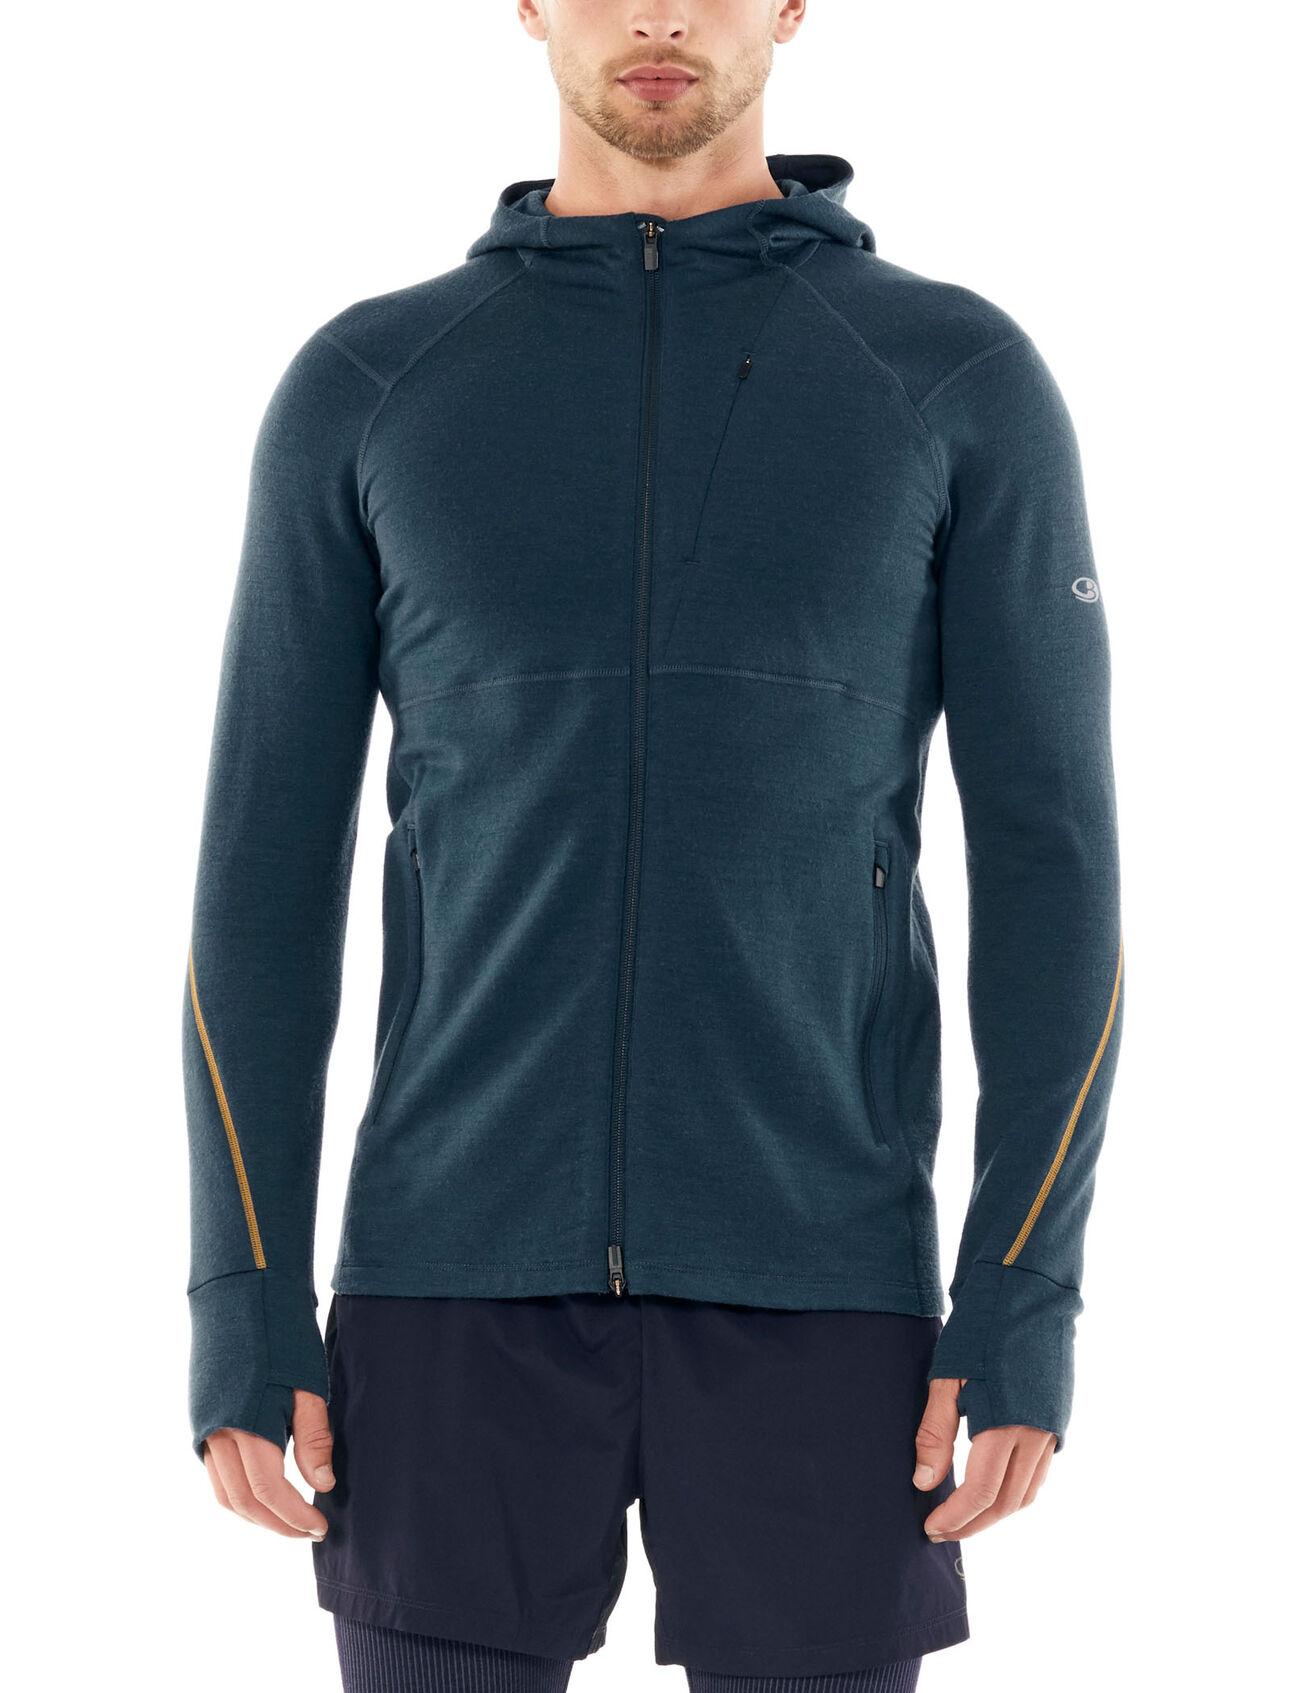 Icebreaker Mens Quantum II Long Sleeve Zip Hood